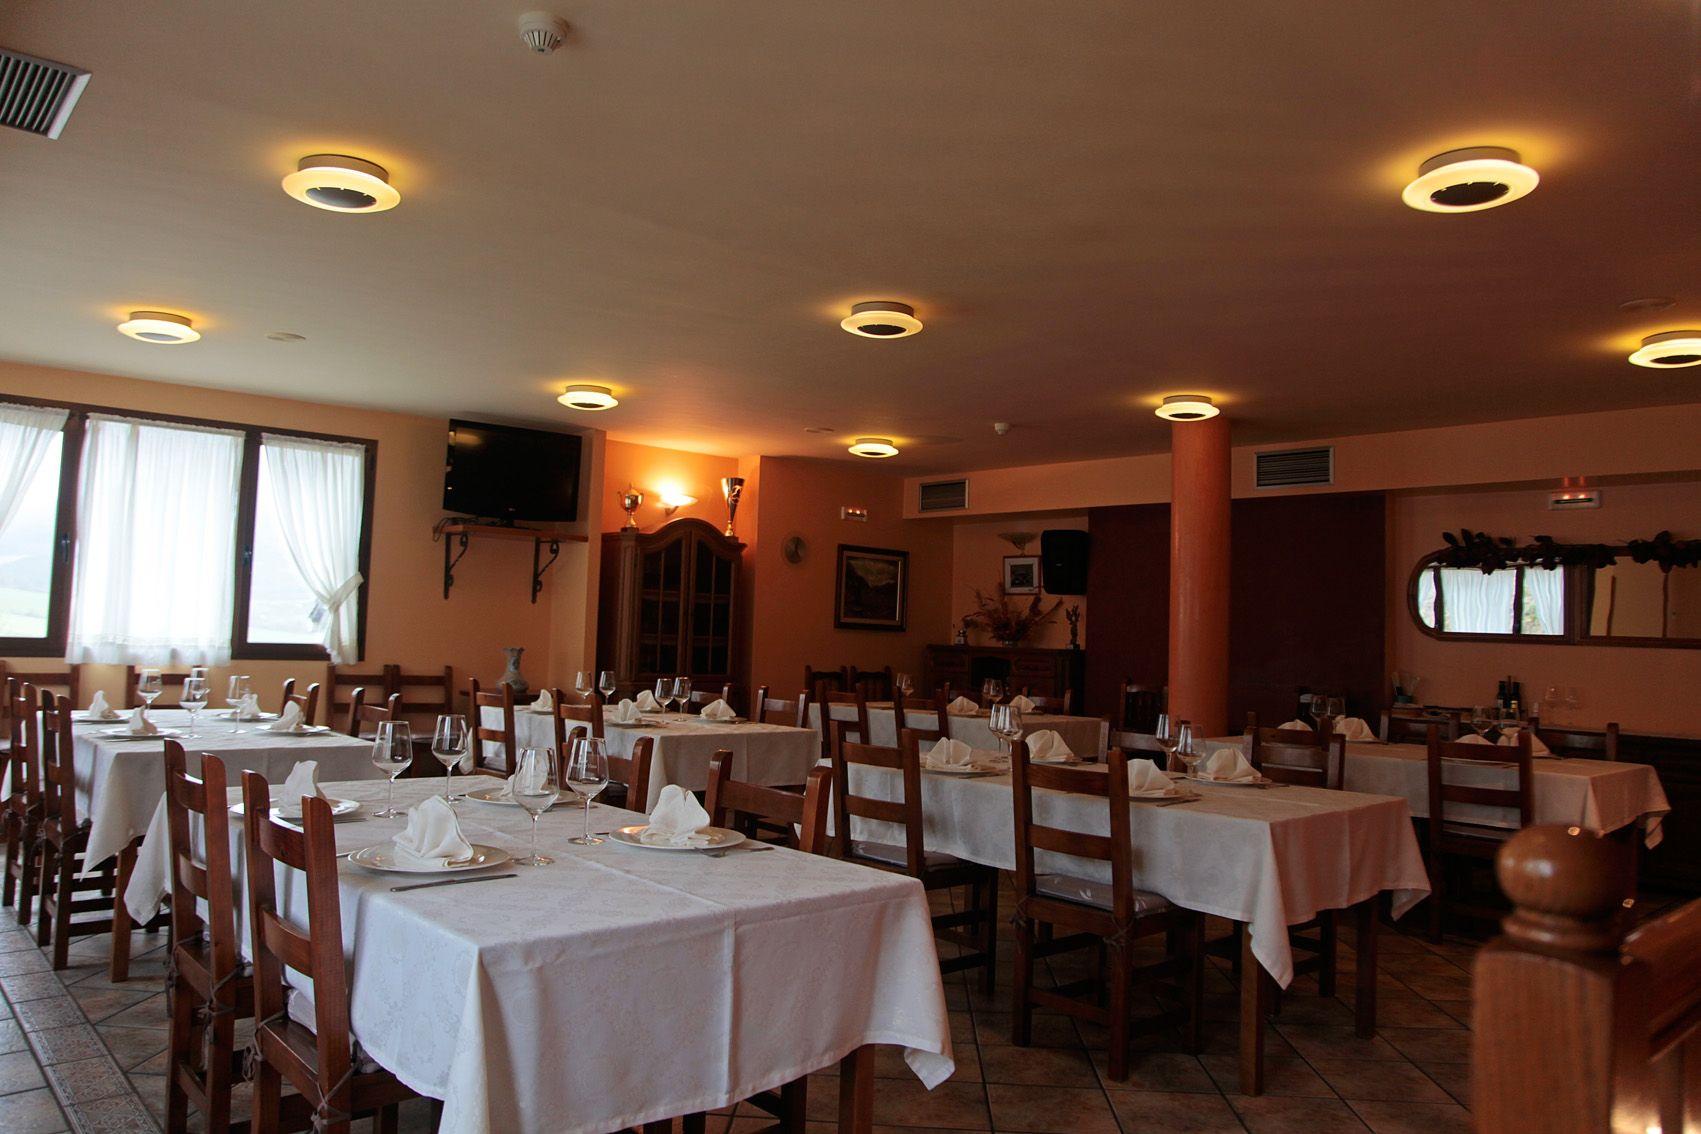 Foto 2 de Restaurante en Juslapeña | Restaurante Casa Arteta